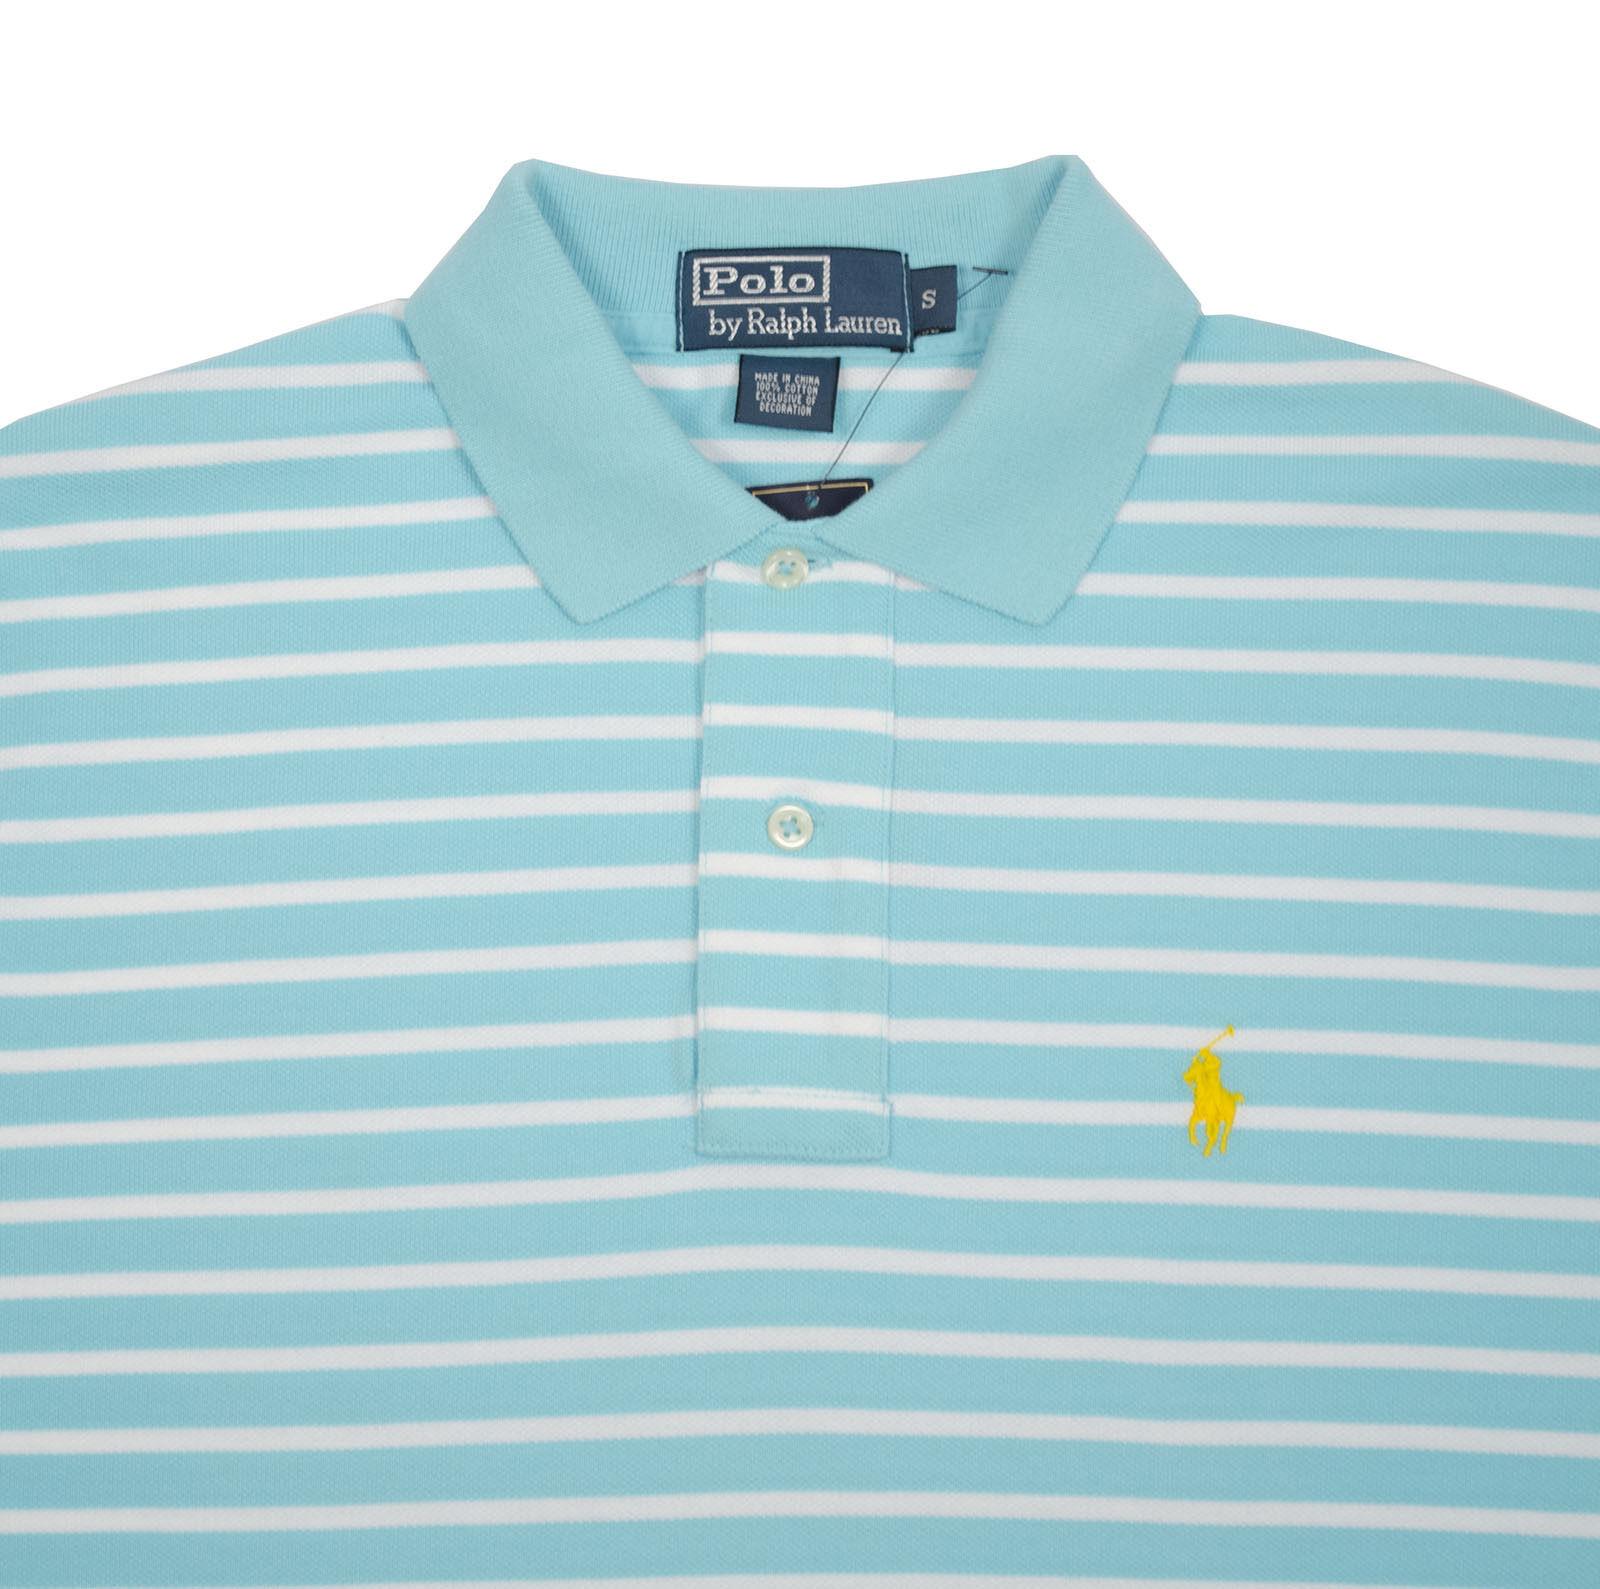 POLO RALPH LAUREN CLASSIC FIT MESH STRIPED MEN'S SHIRTS blueE SMALL SHIRT AS308